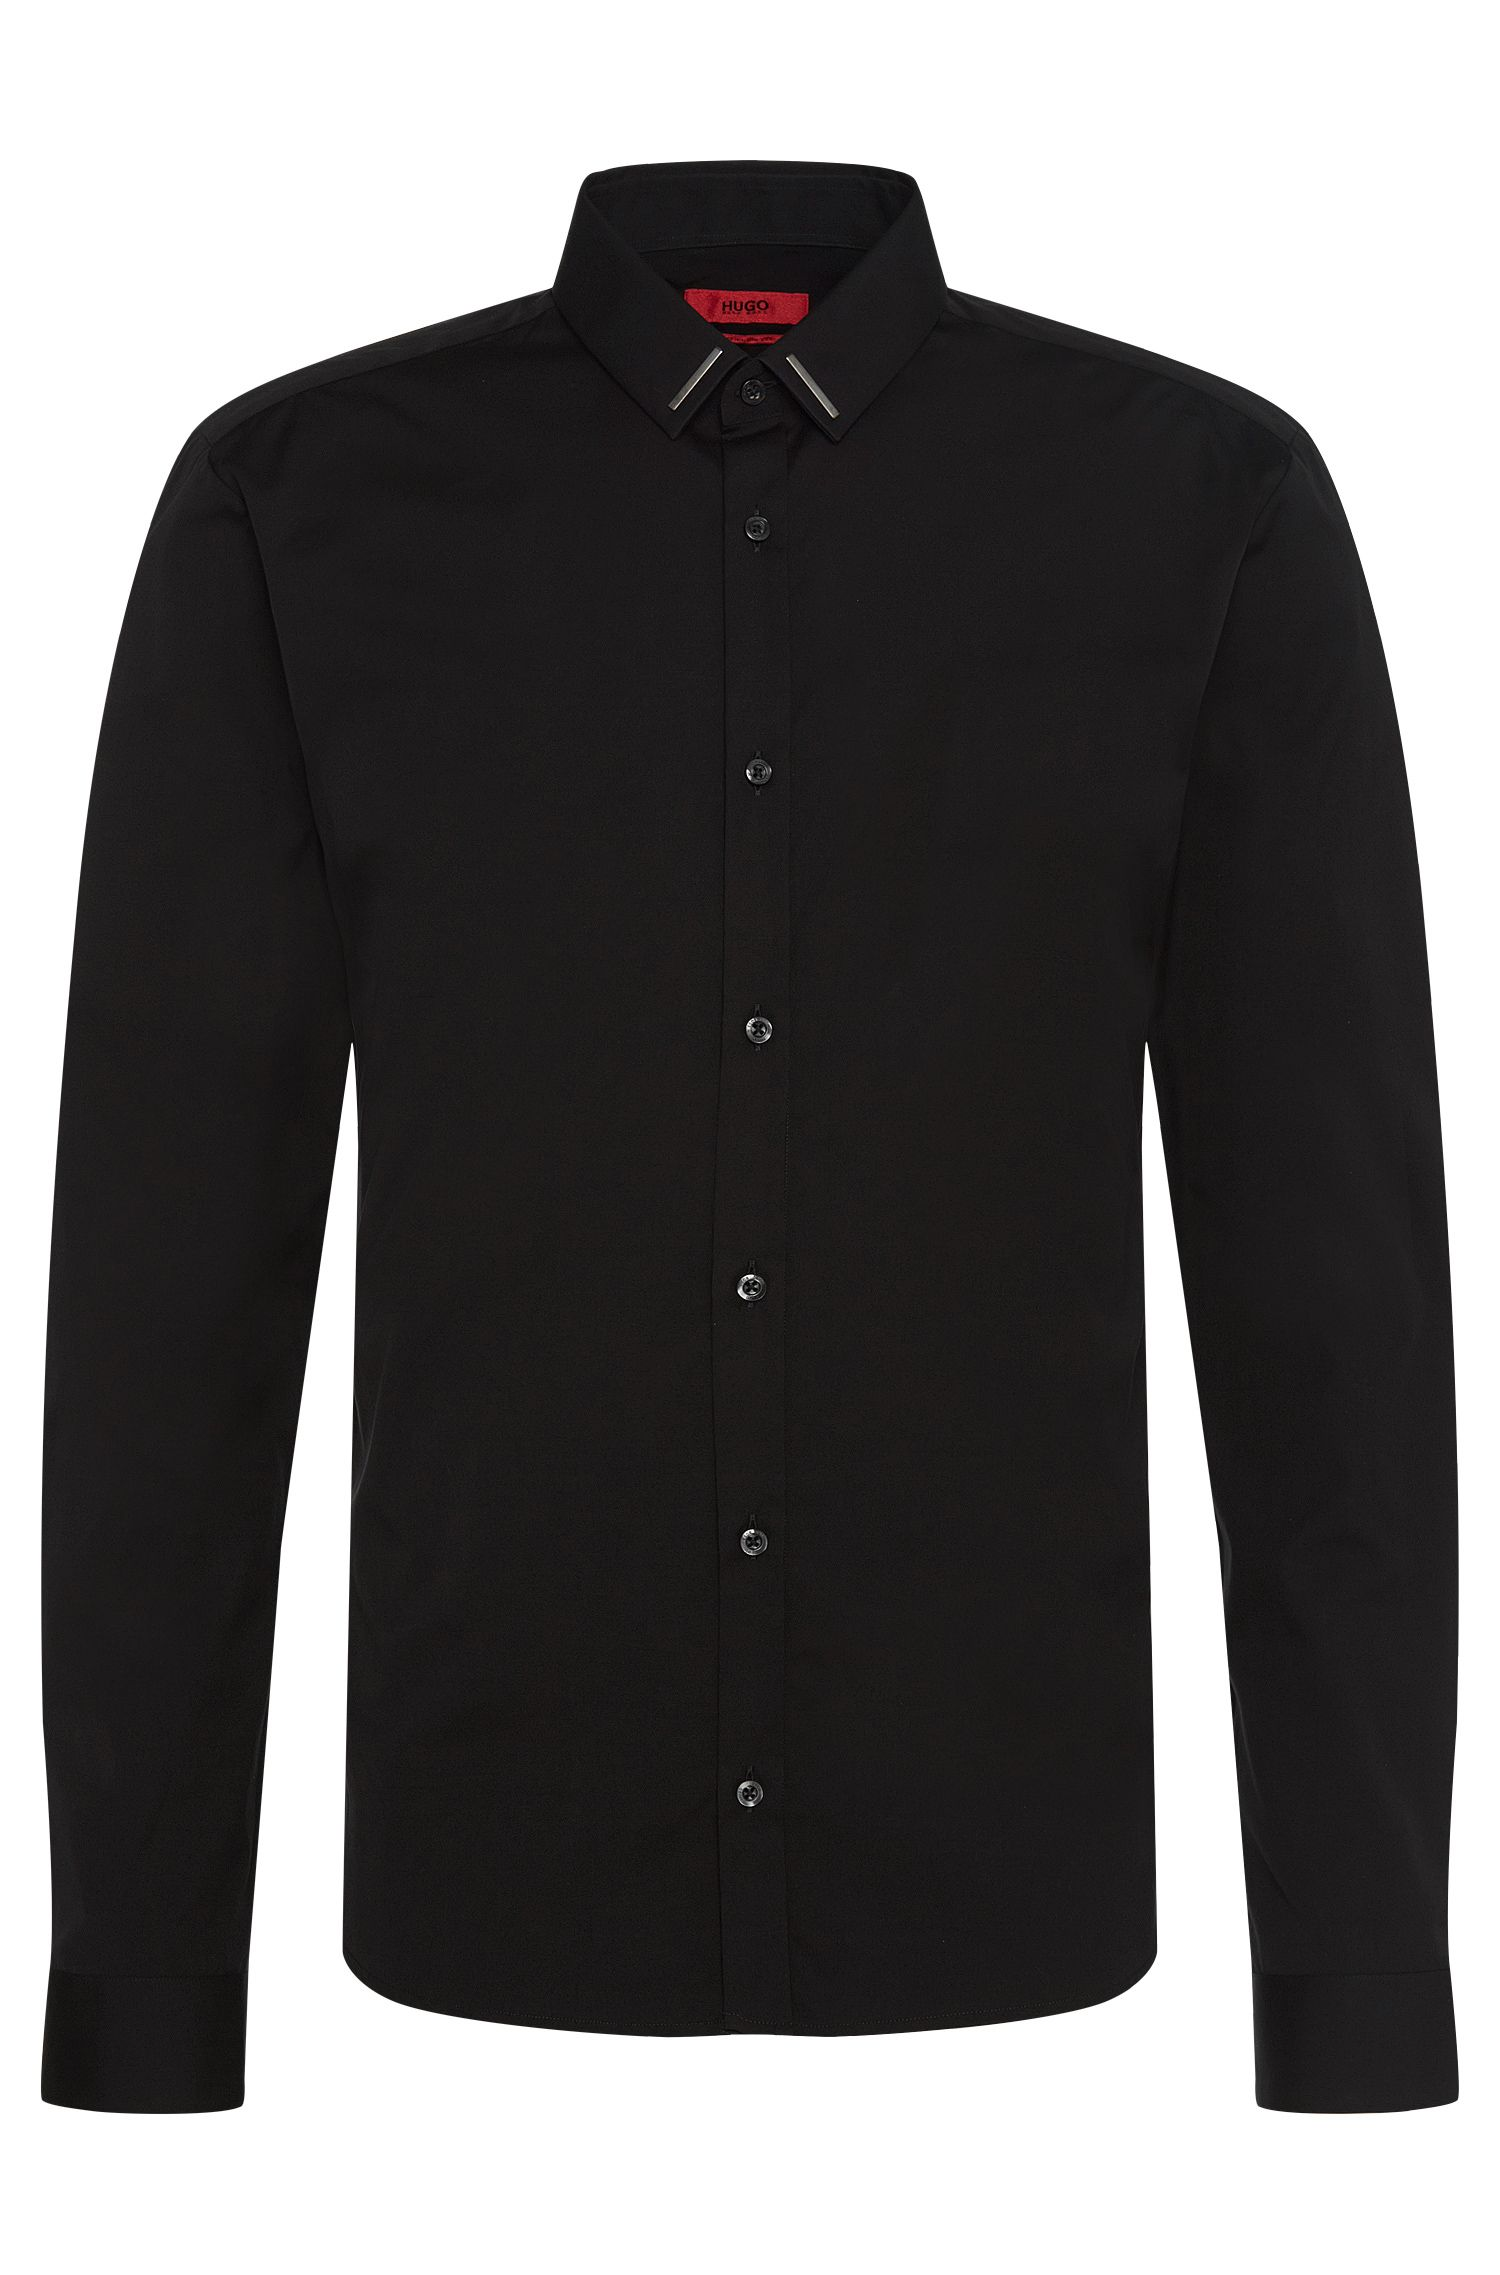 'Ero'   Slim Fit, Stretch Cotton Button Down Shirt